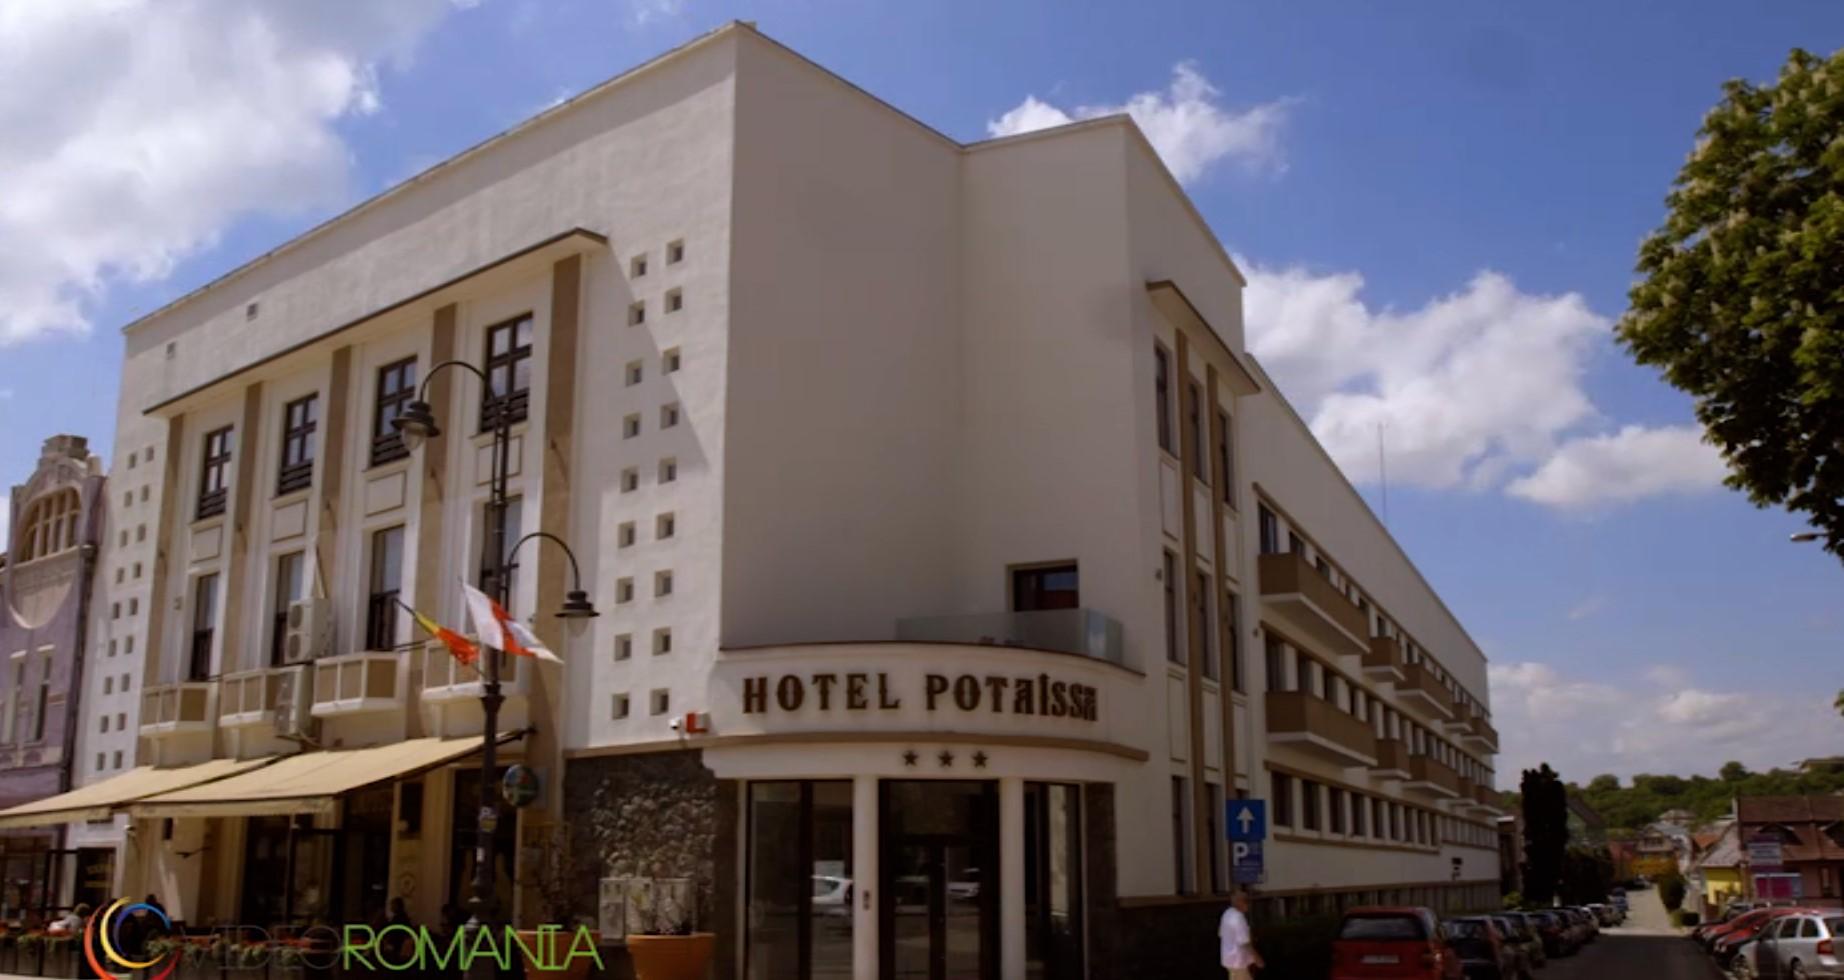 POTAISSA Hotel Turda Cluj